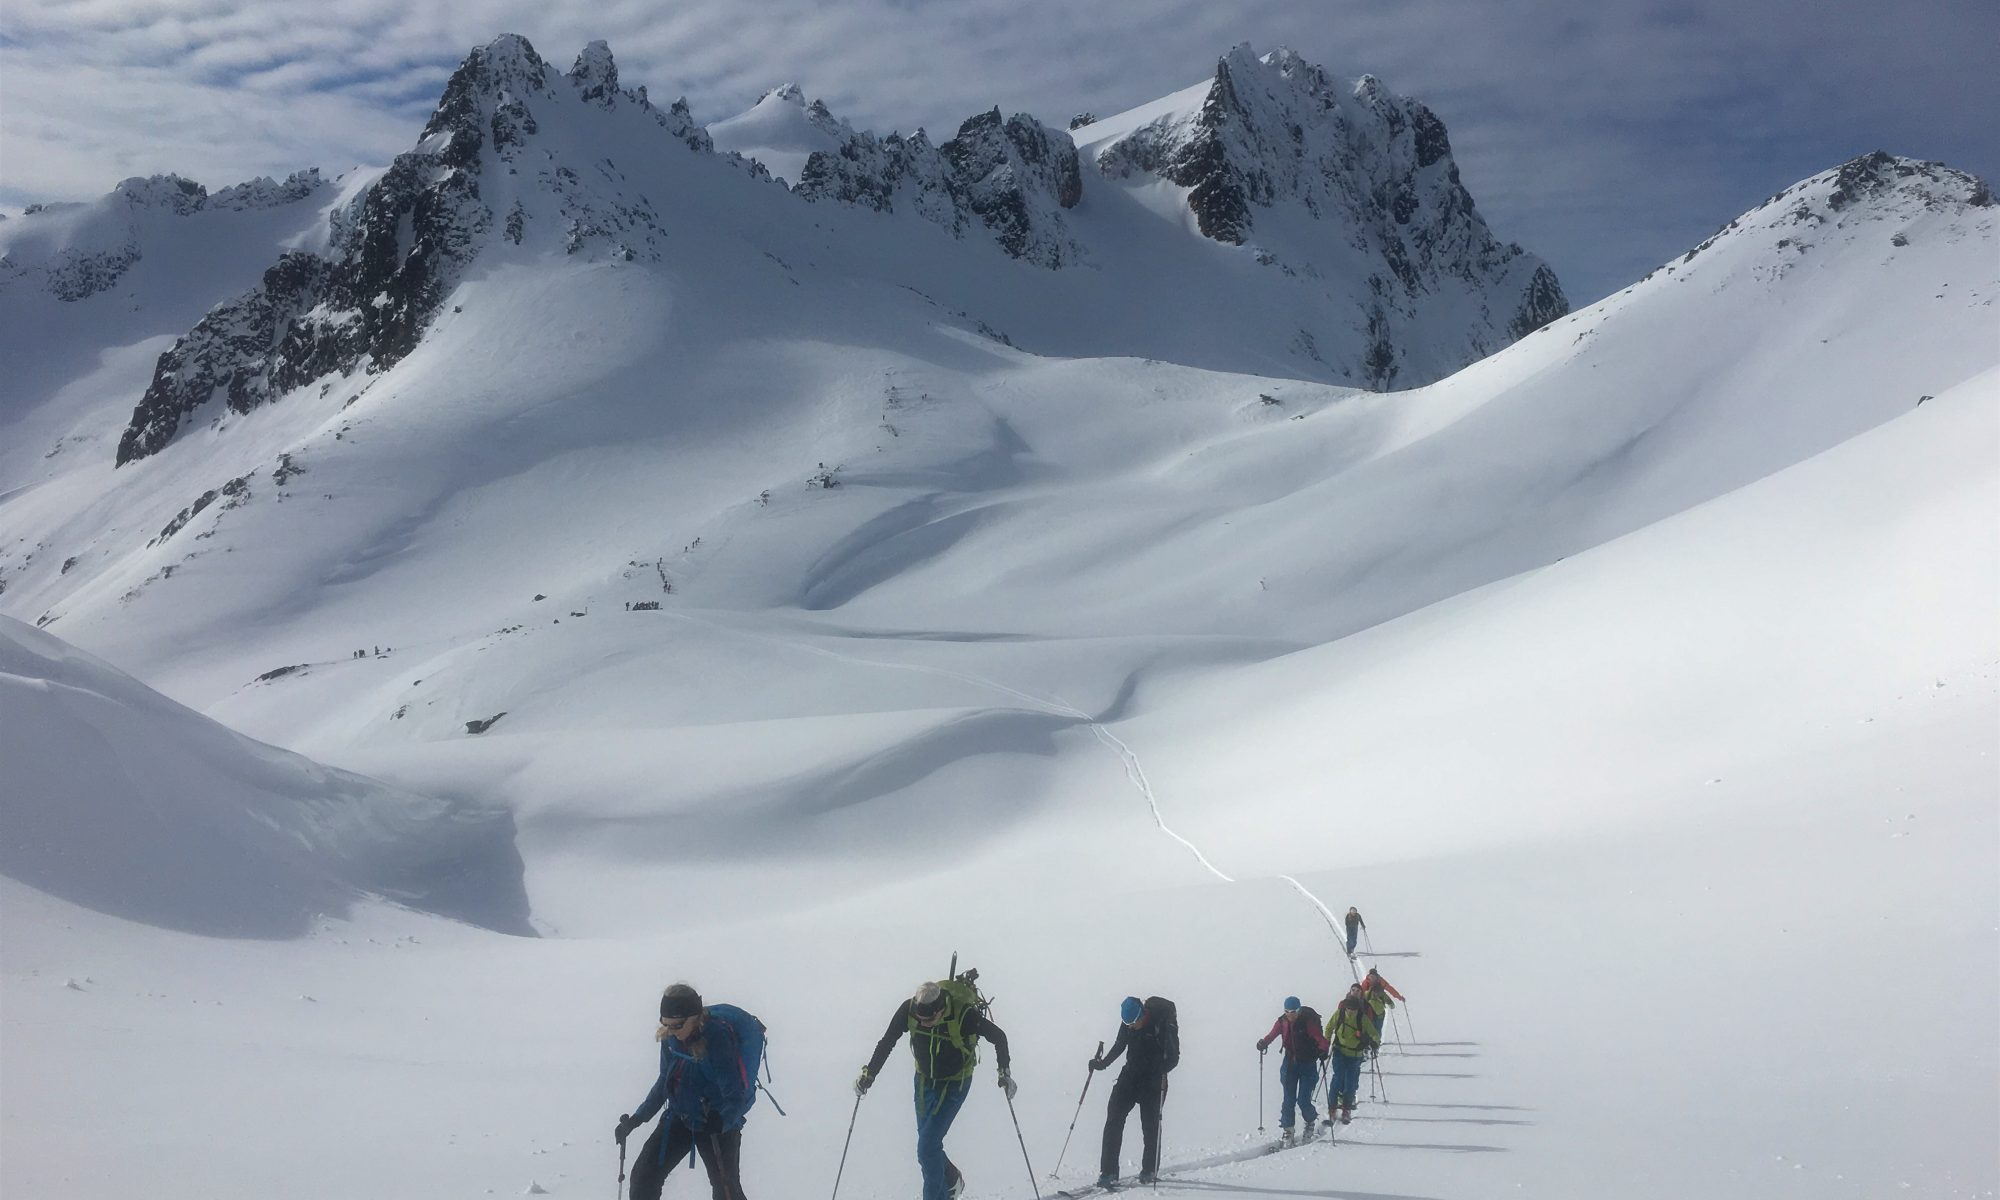 Aalesunds Skiklub